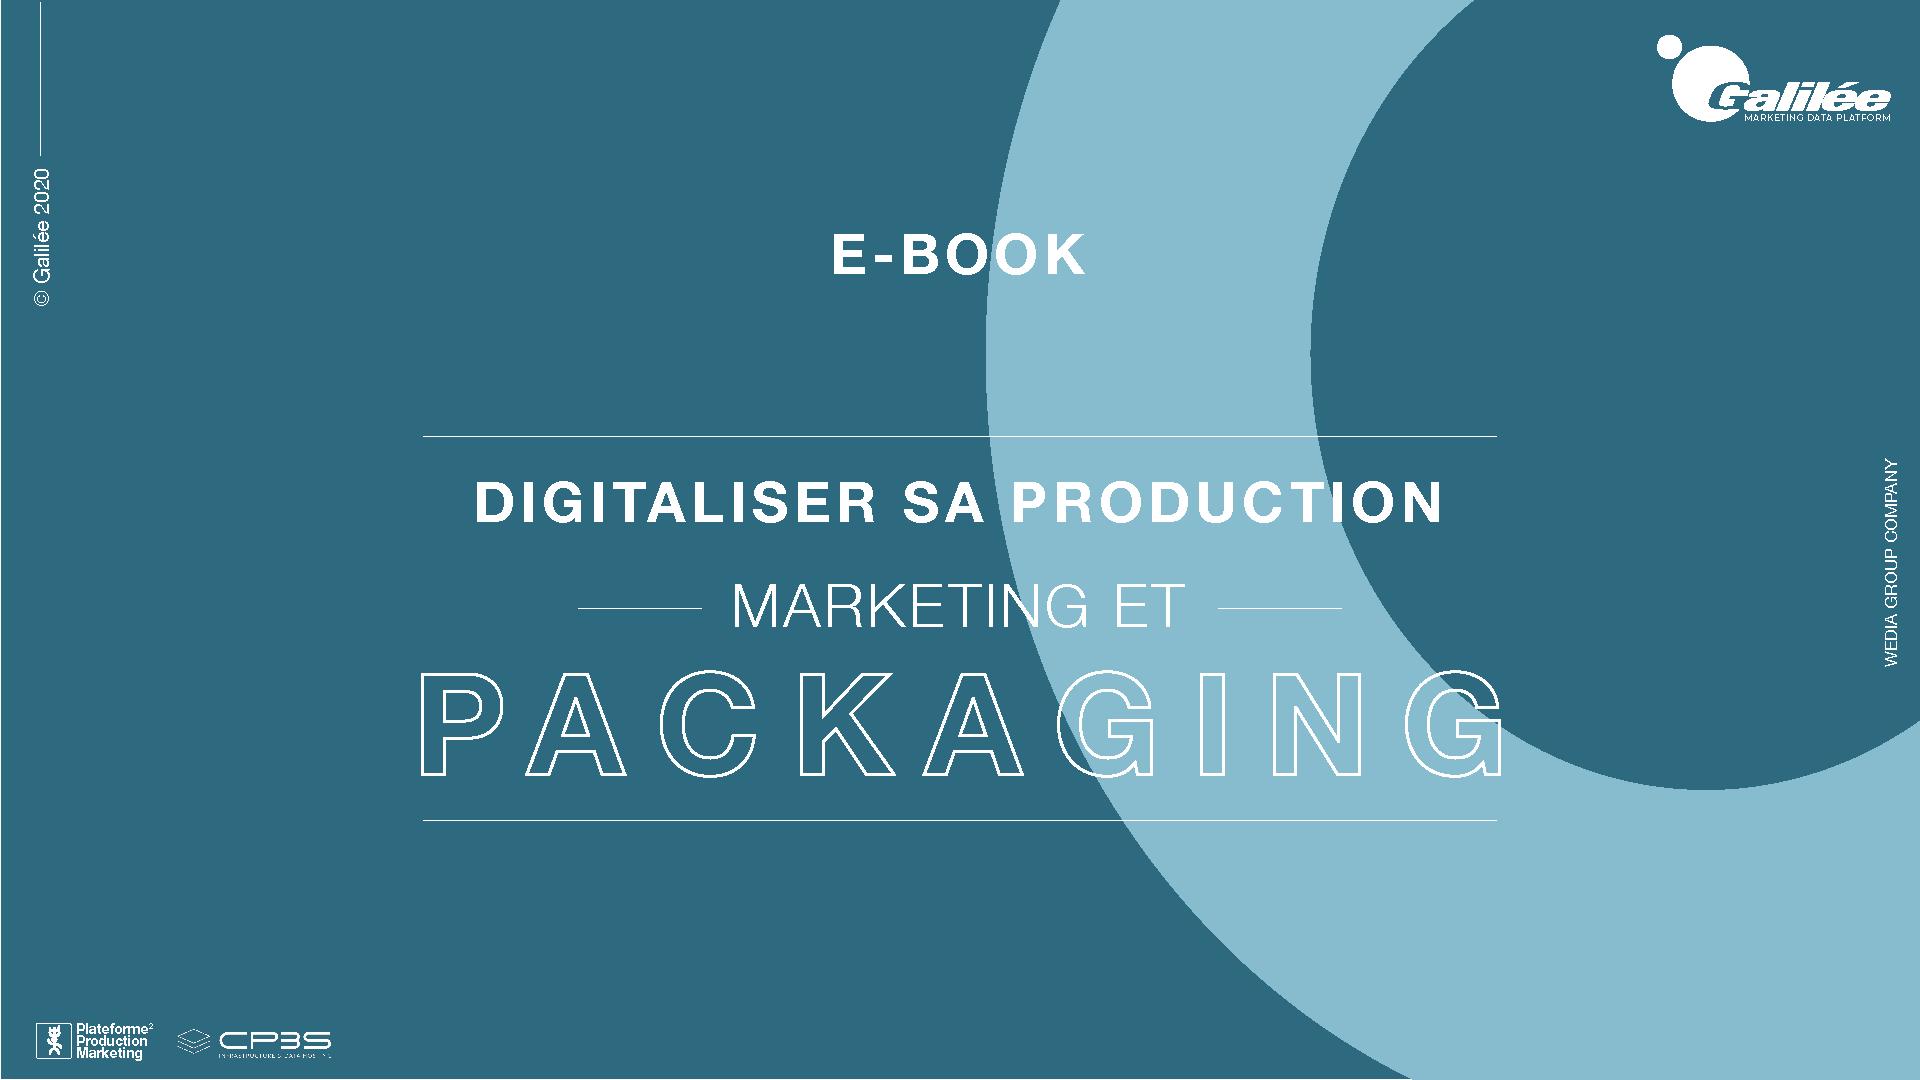 Digitaliser sa production packaging